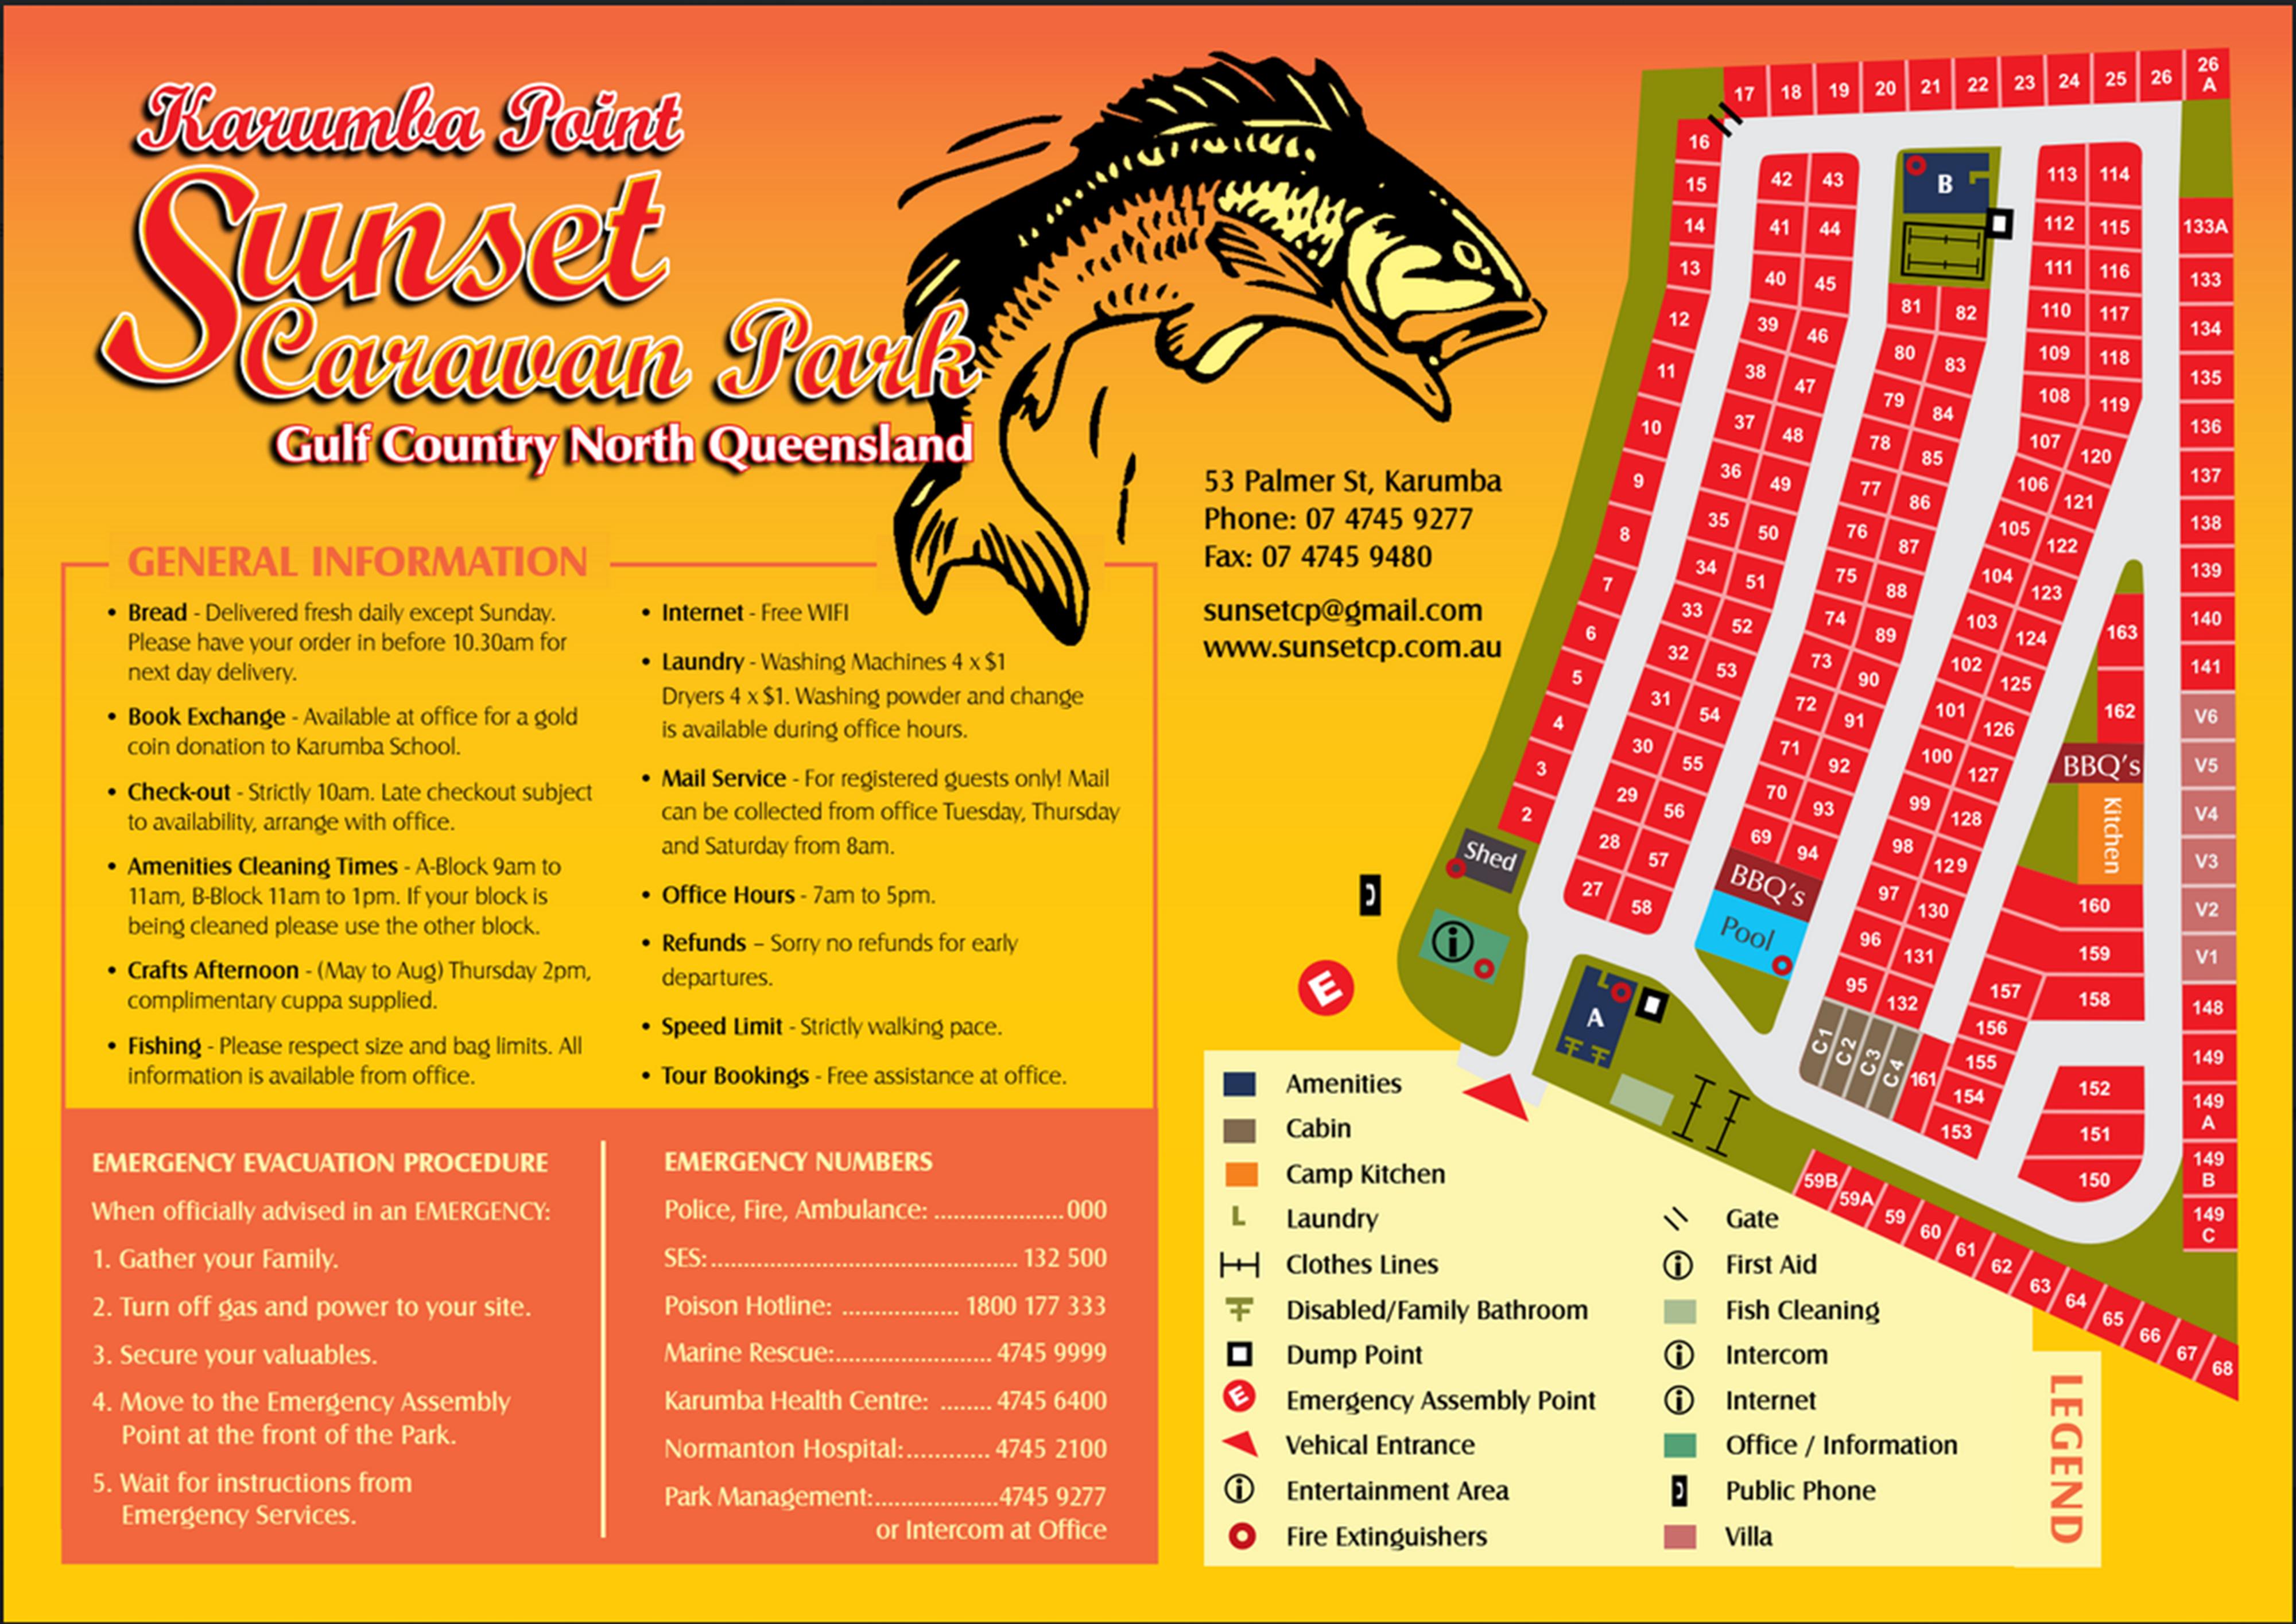 Karumba Point Sunset Caravan Park Site Plan